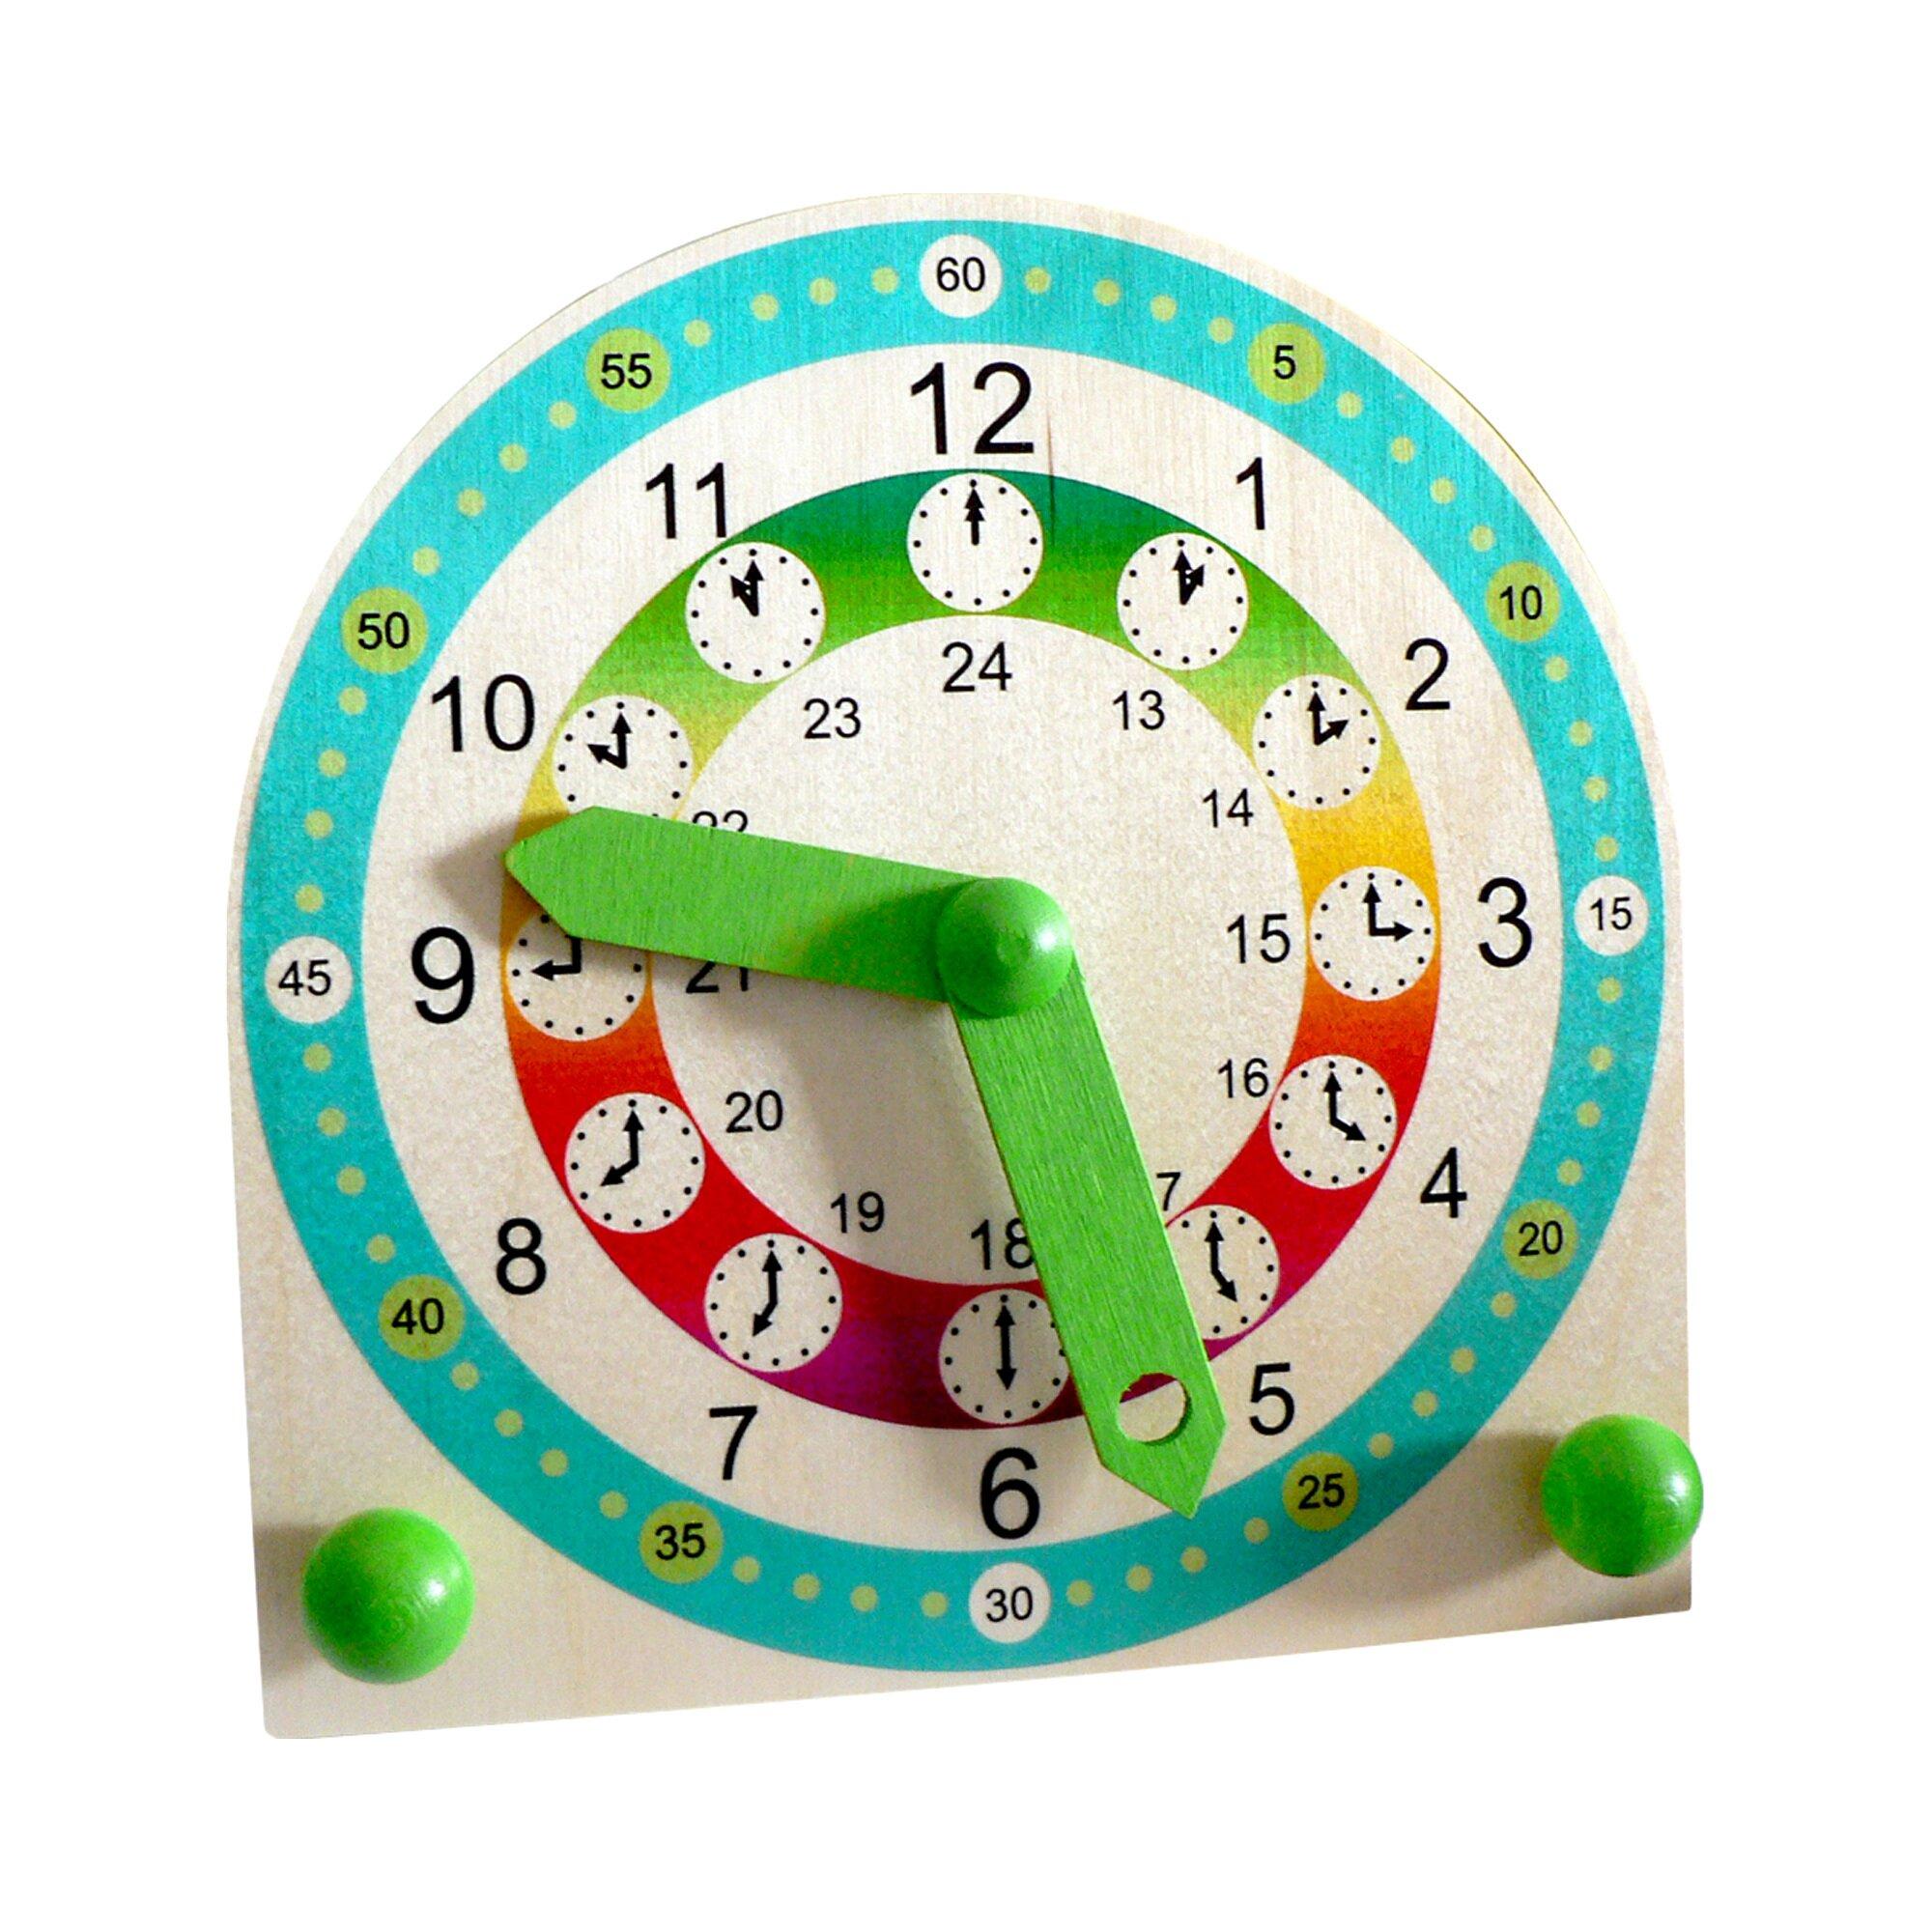 Hess Spielzeug Stand-Kinderlernuhr